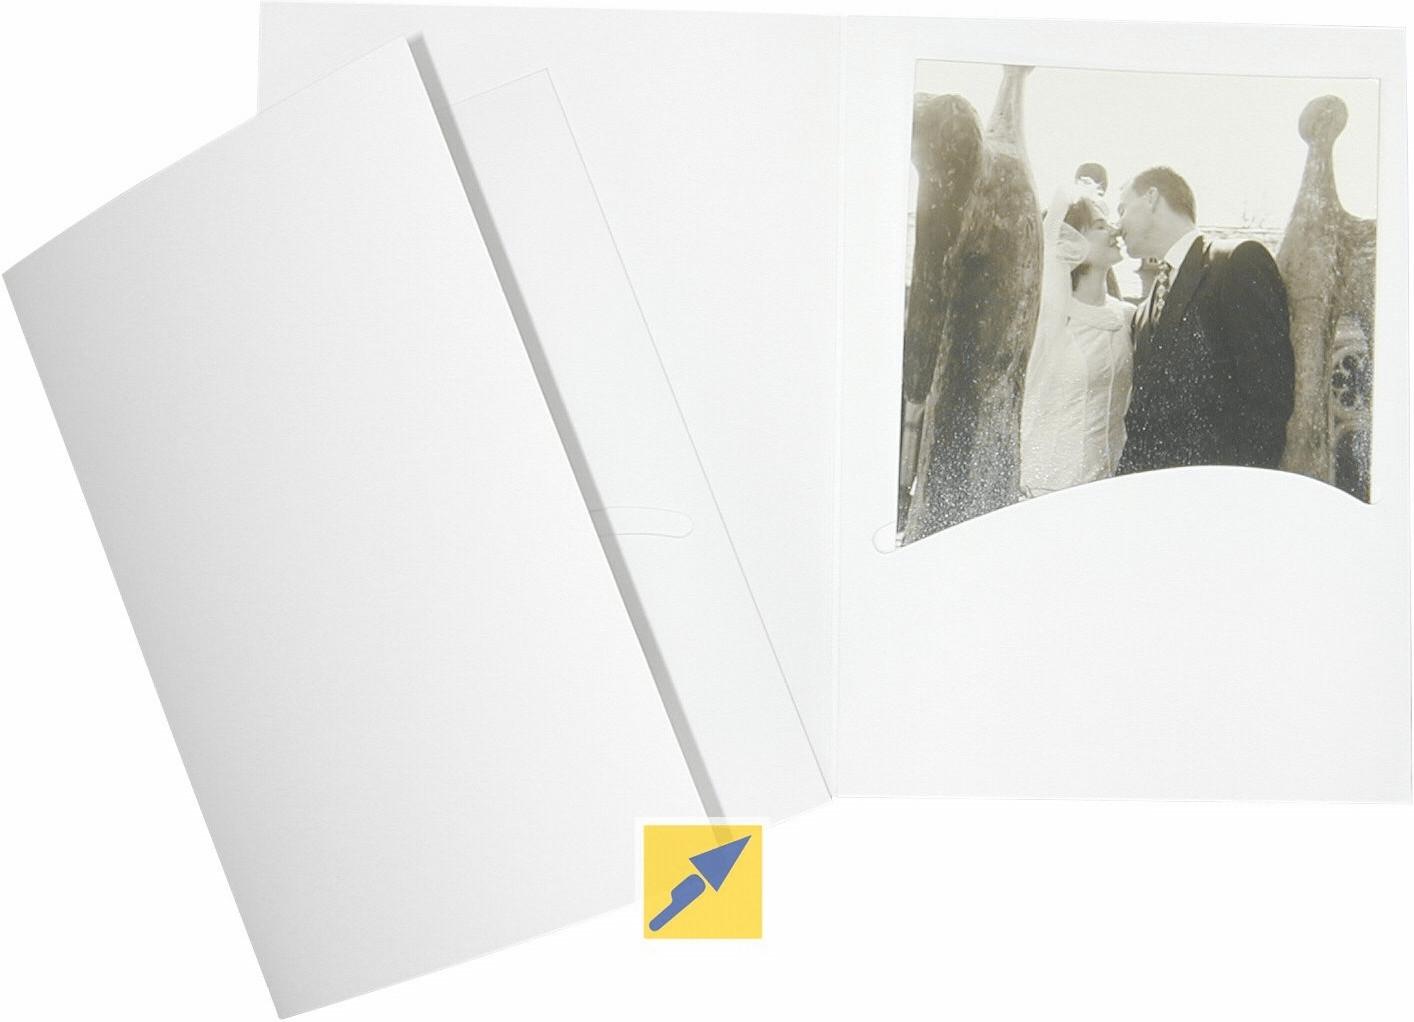 Image of Daiber 1x100 Photo Holder Profi-Line 13x18